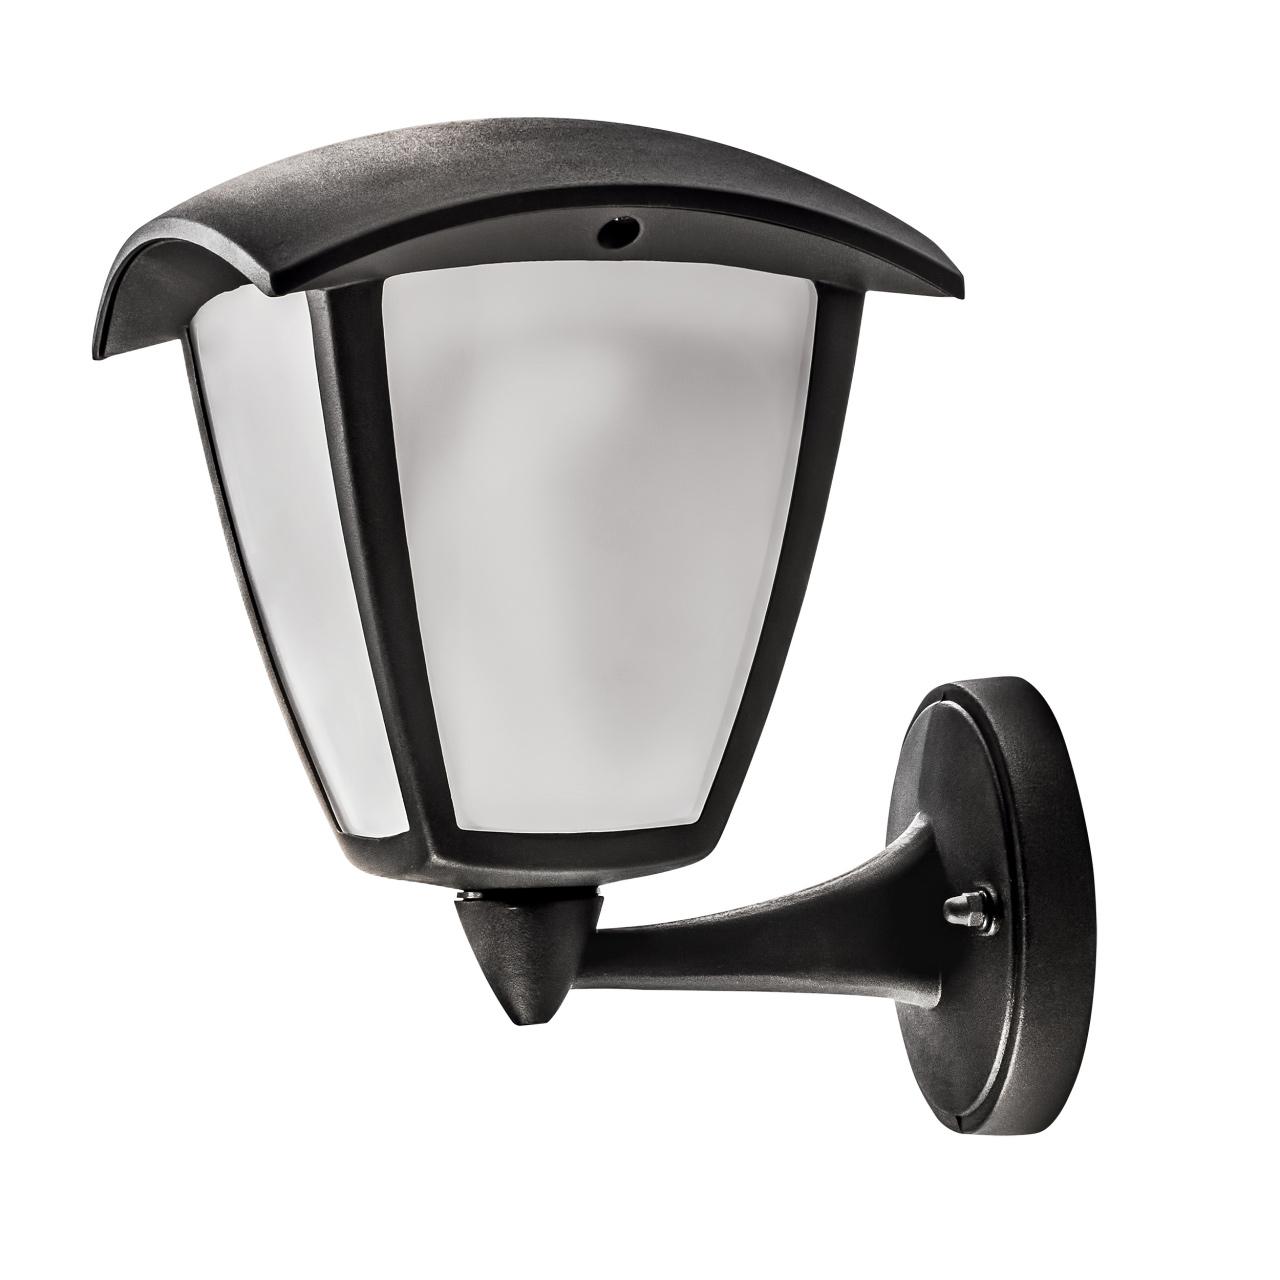 Светильник уличный настенный Lampione LED 8W 360LM 3000K IP54 Lightstar 375670